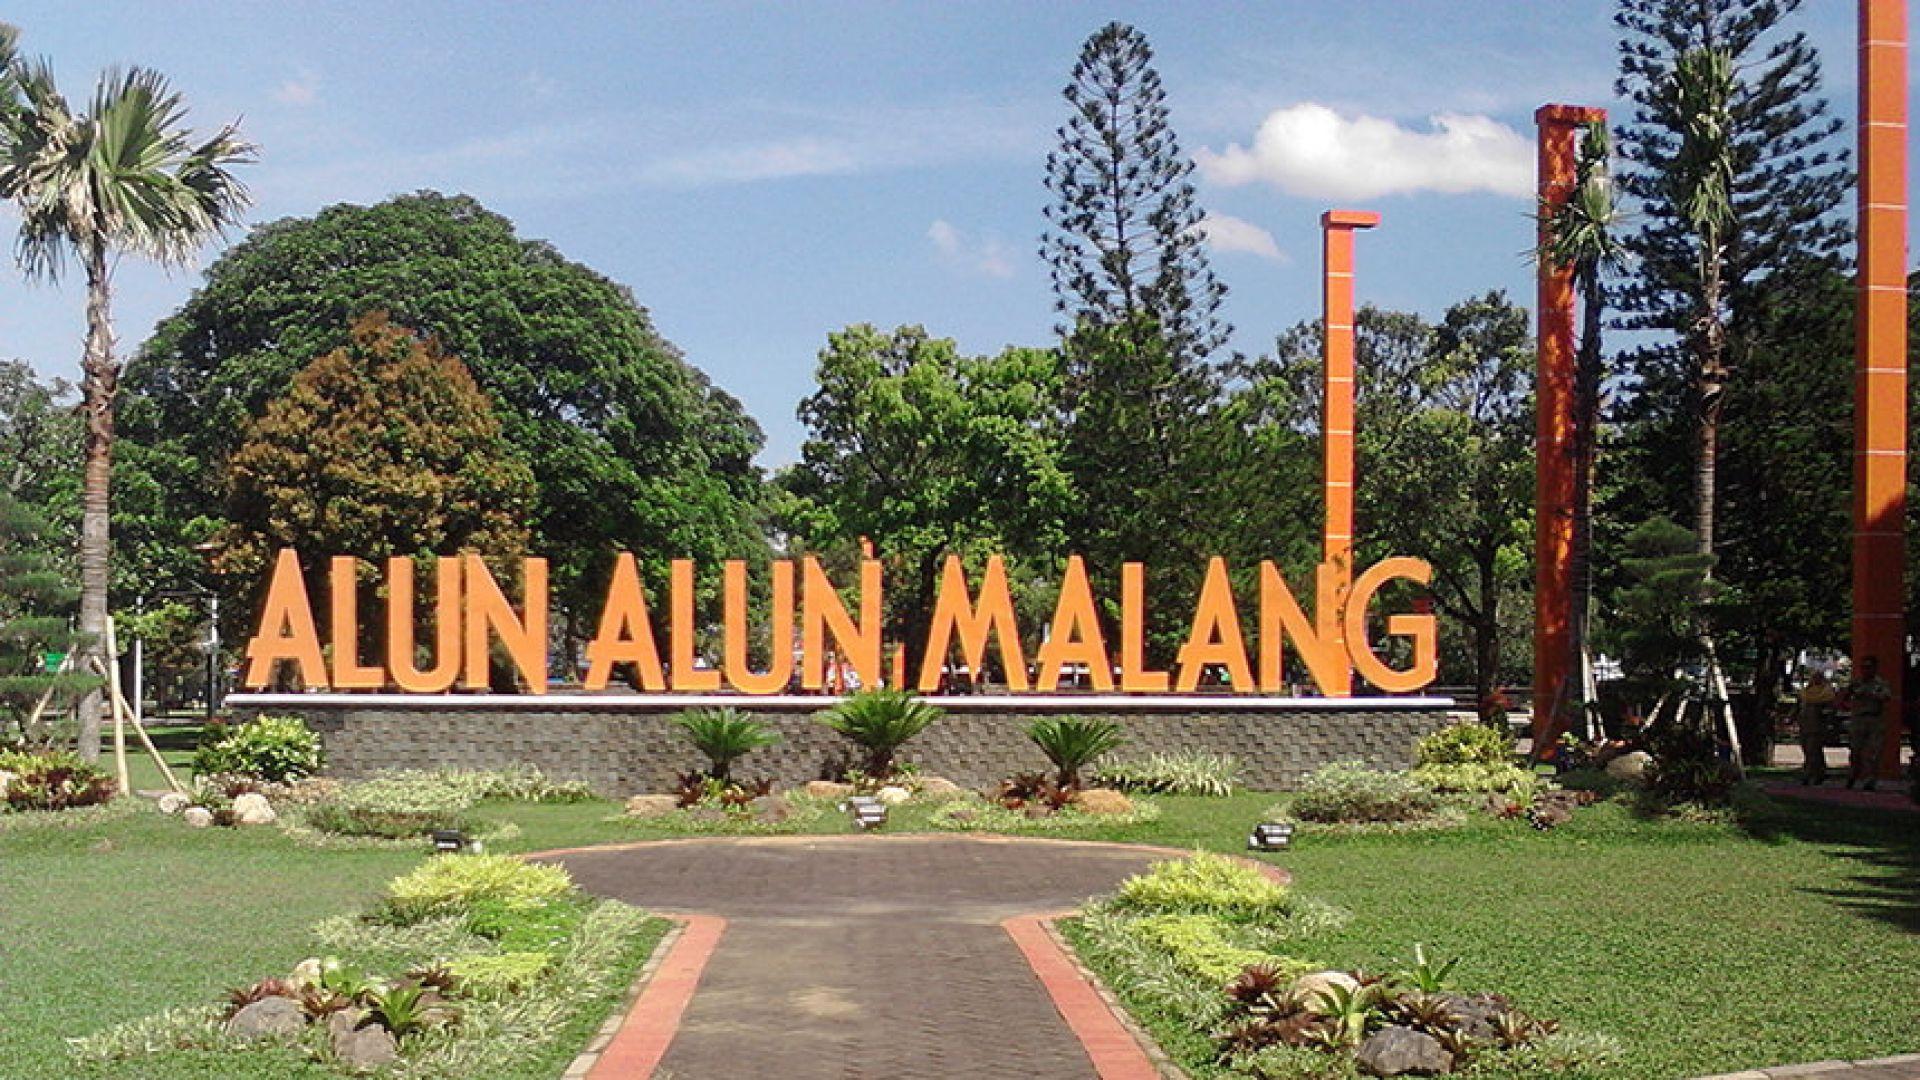 9 Wisata Malang Dekat Stasiun Yang Instagramable